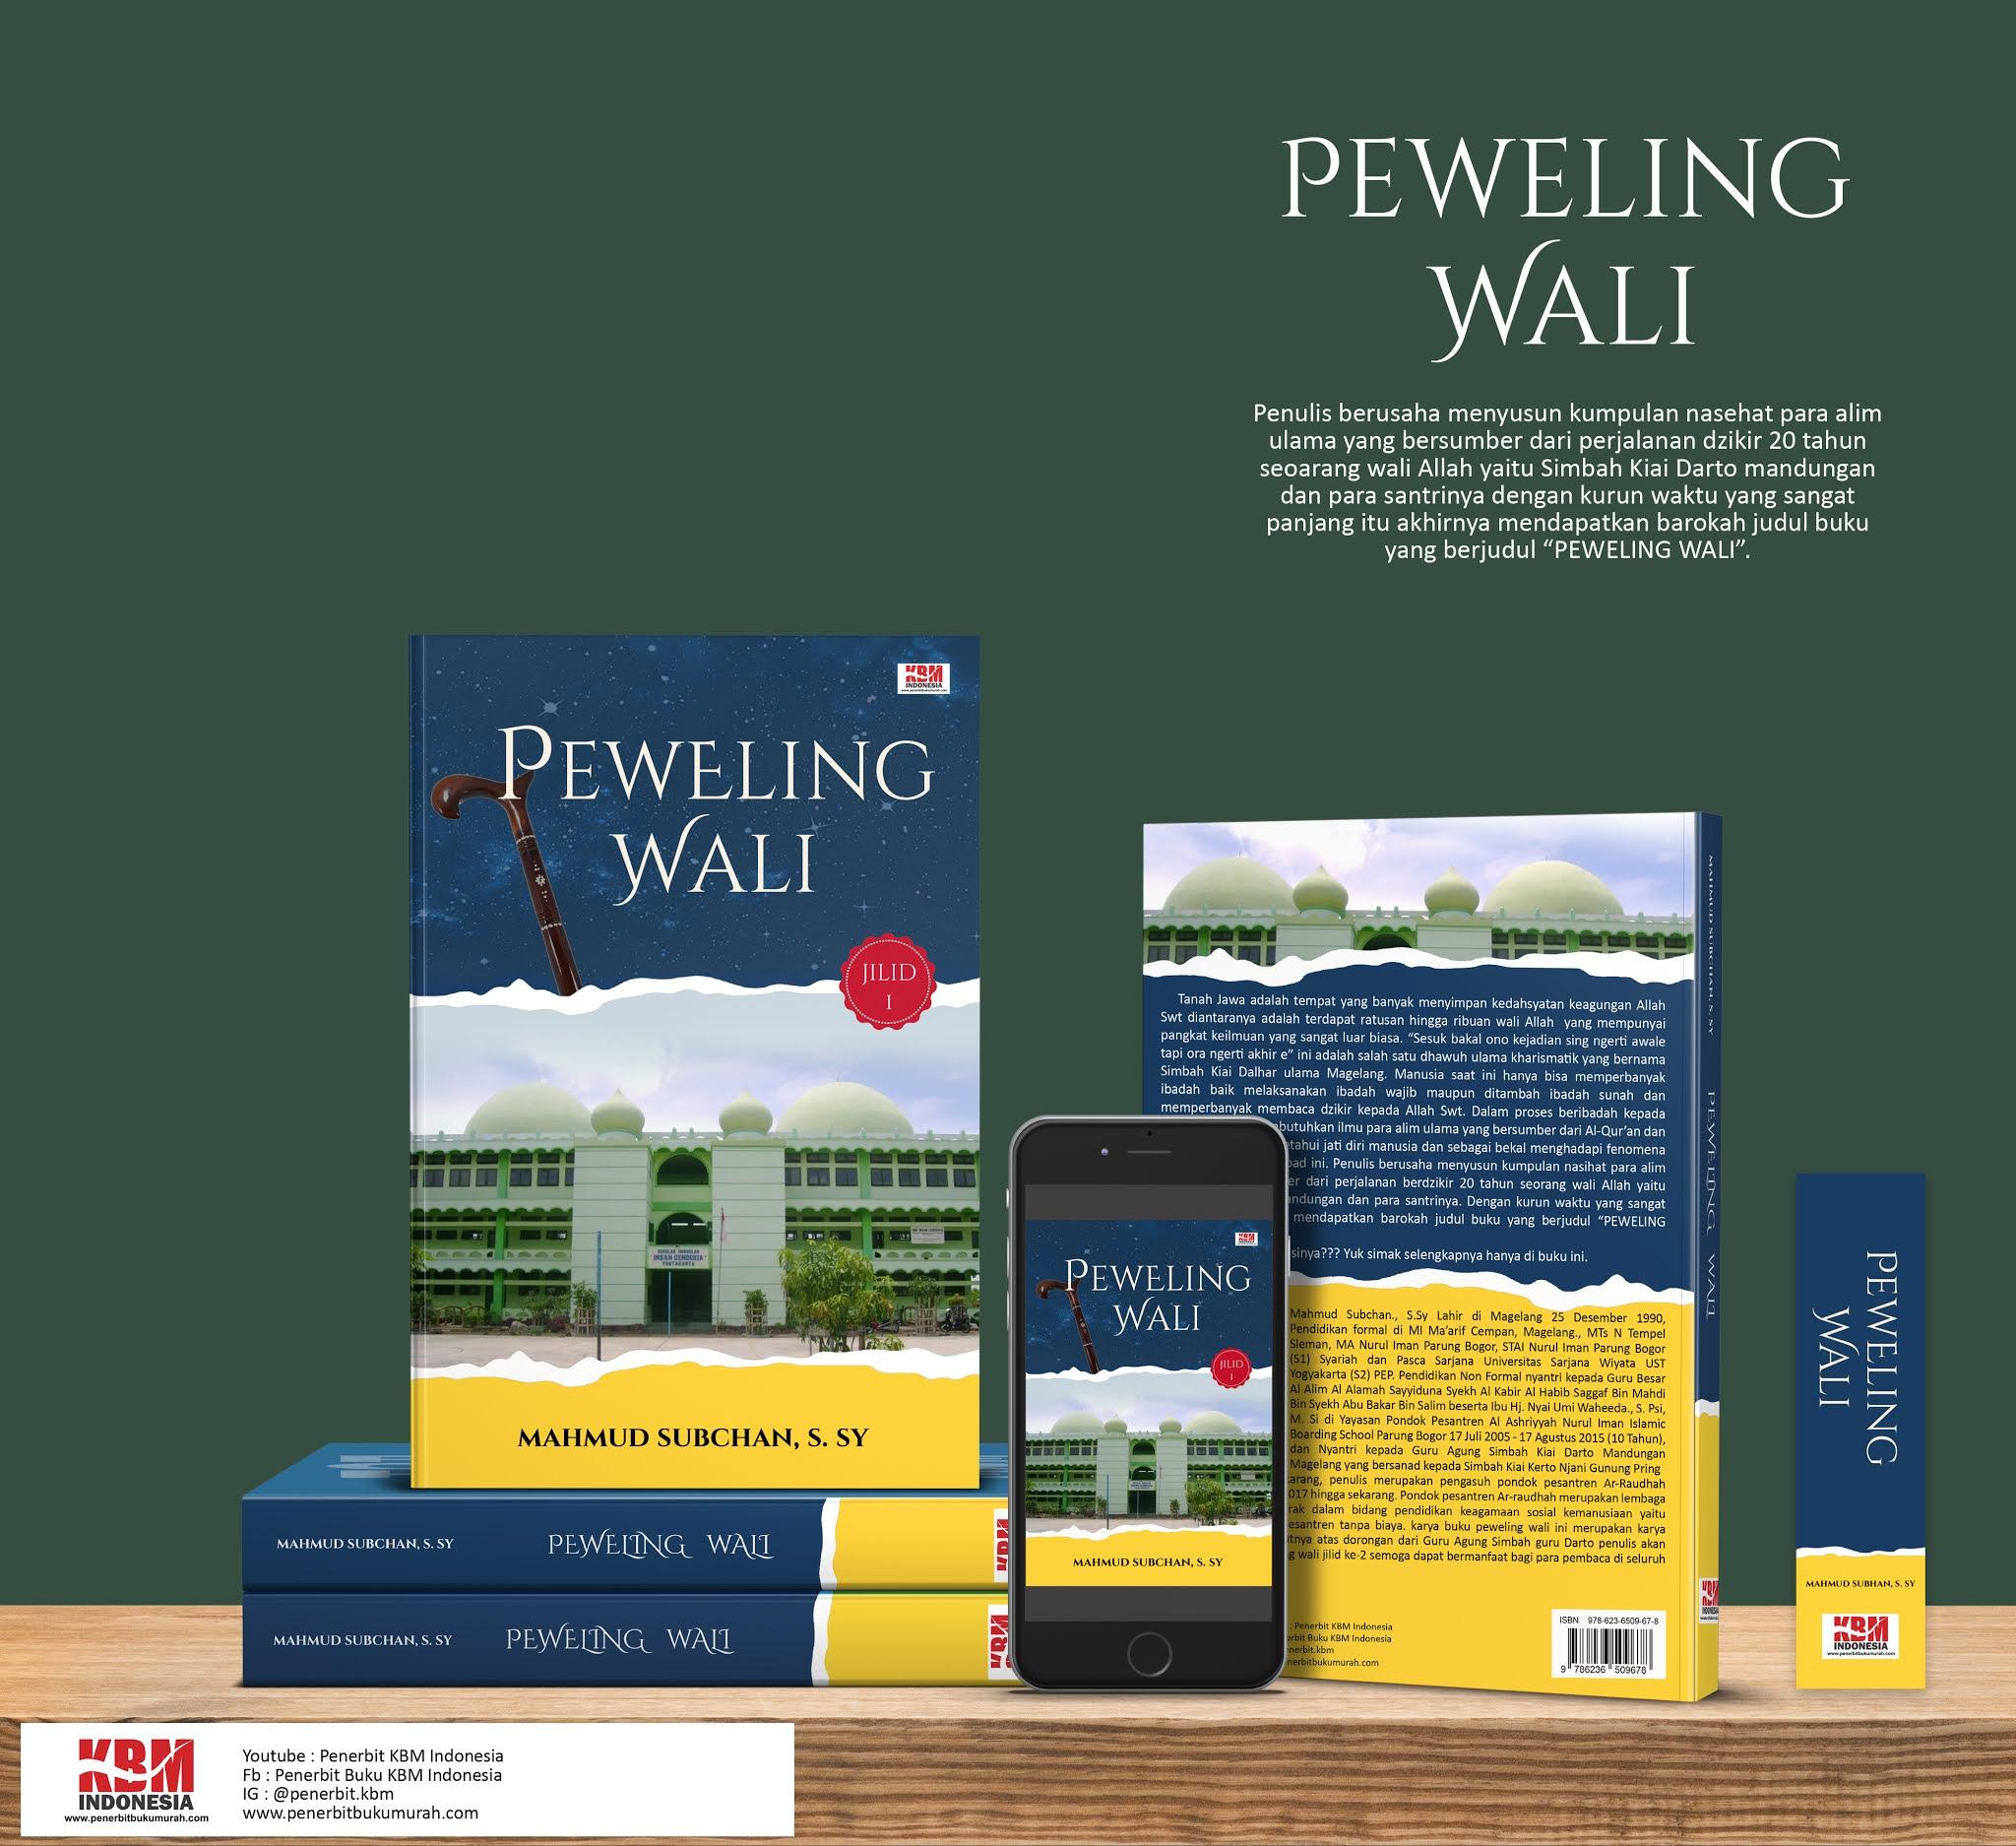 PEWELING WALI